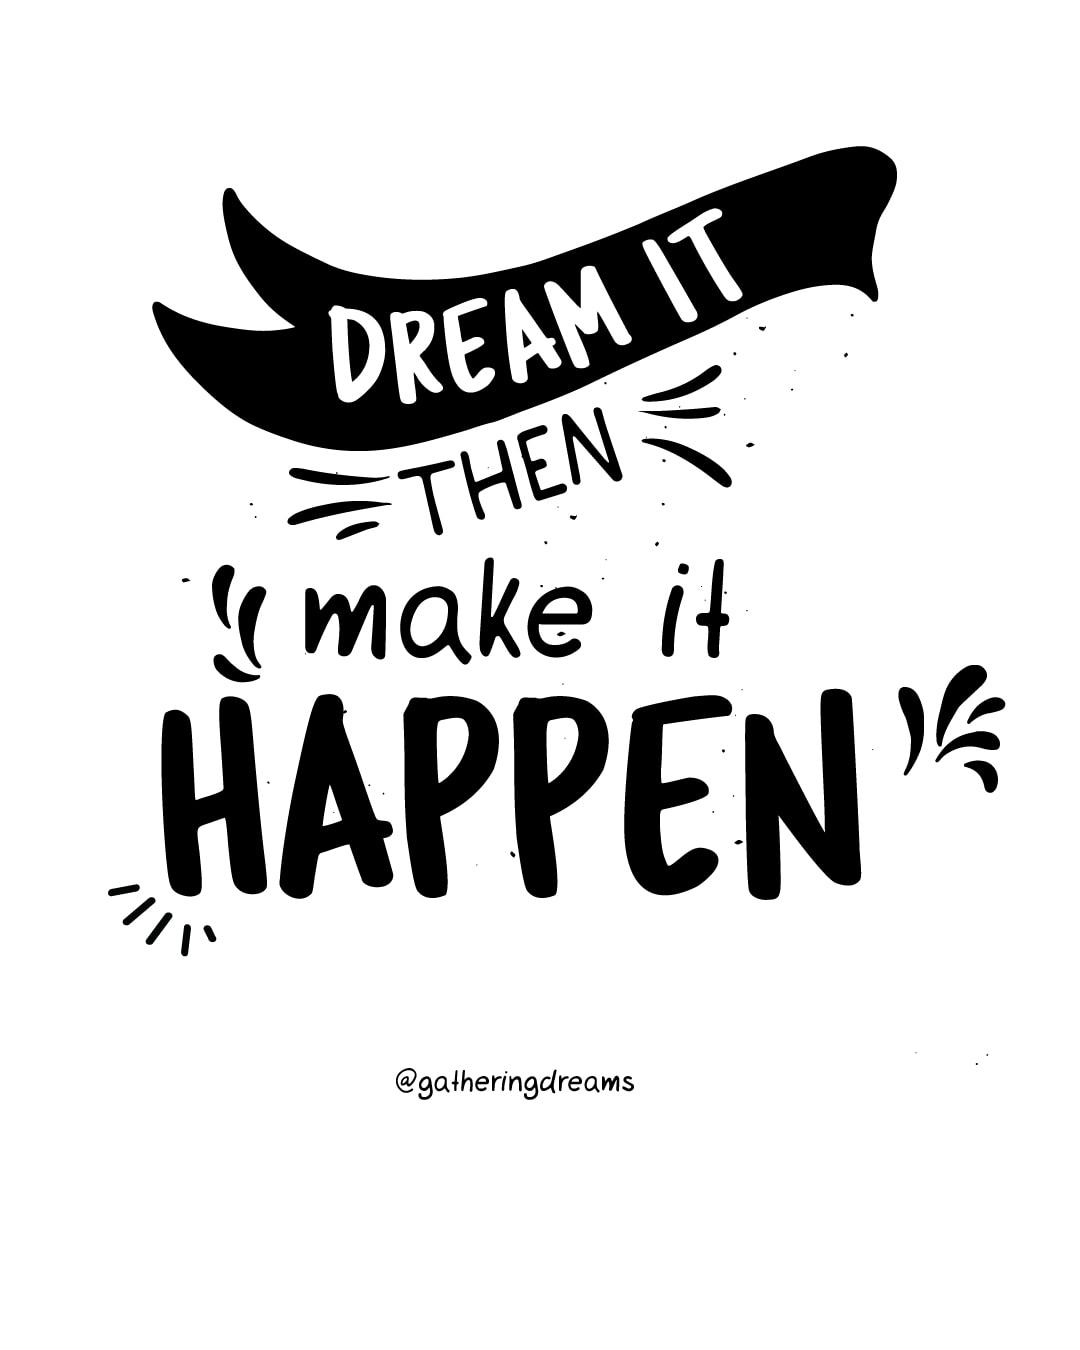 """Dream it, then make it happen."" Inspirational quote about dreams #inspiration #inspirationalquotes #motivationalquotes #dreams"